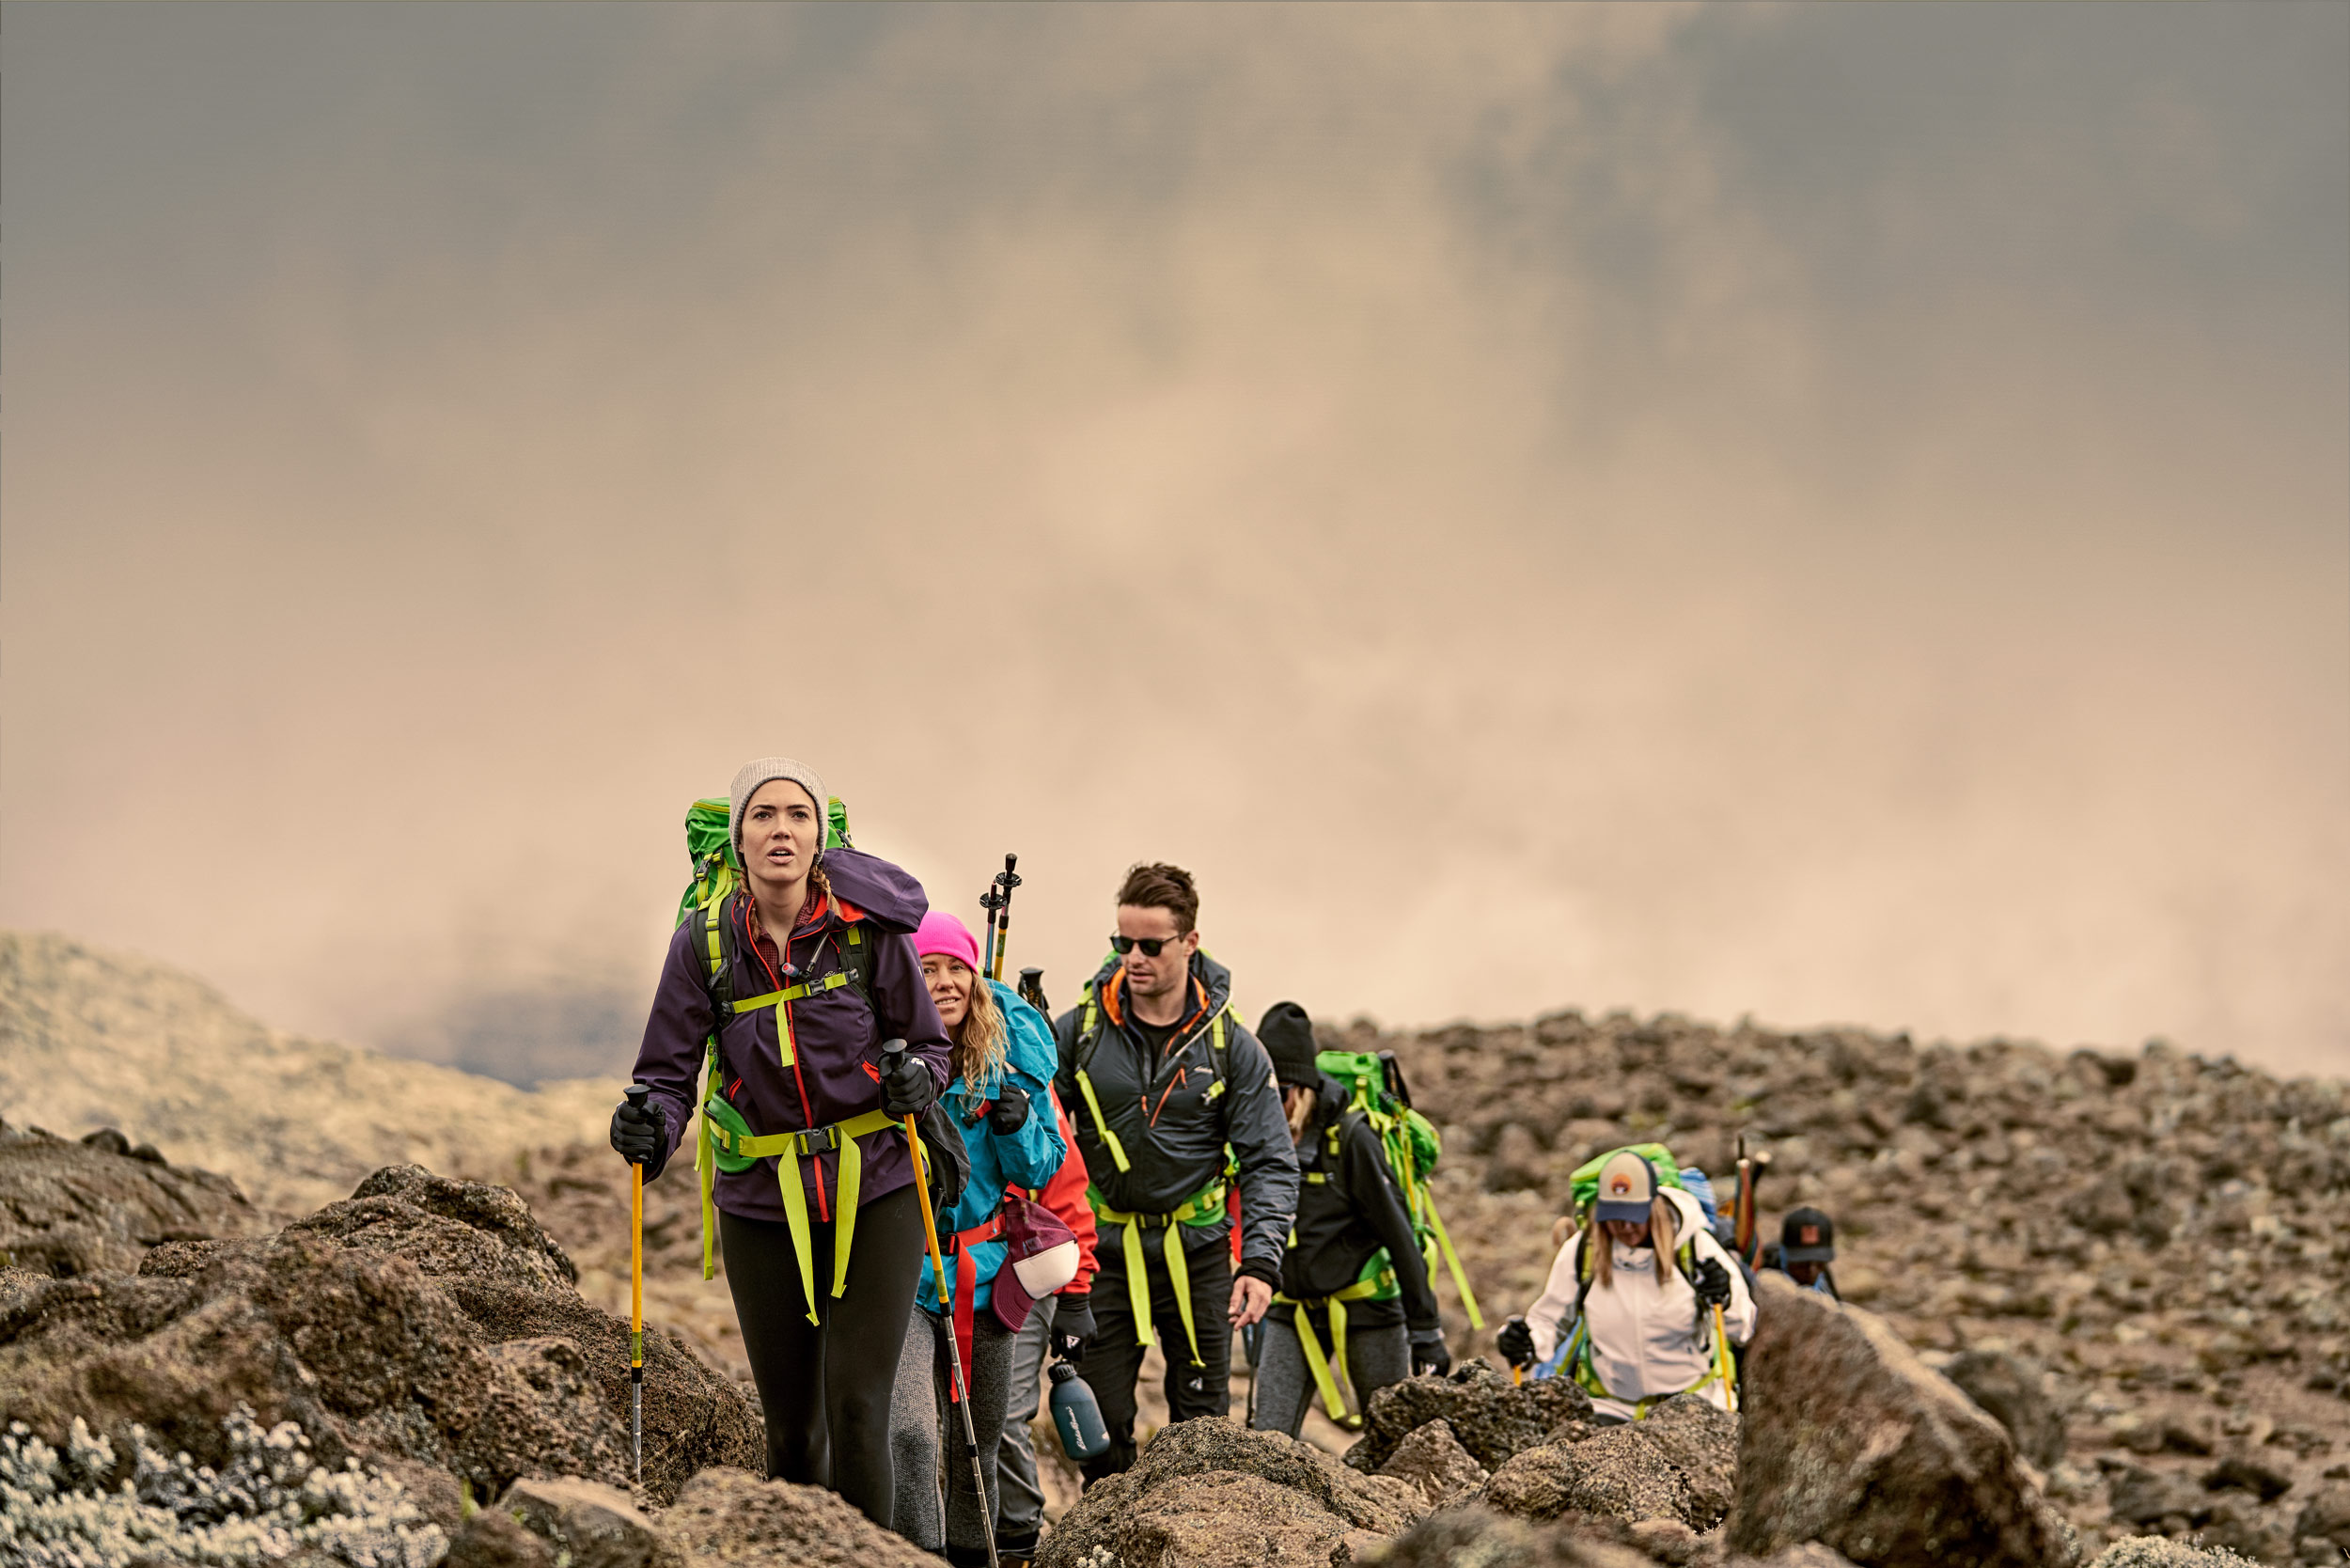 032518-EB_Kilimanjaro_1197_RT